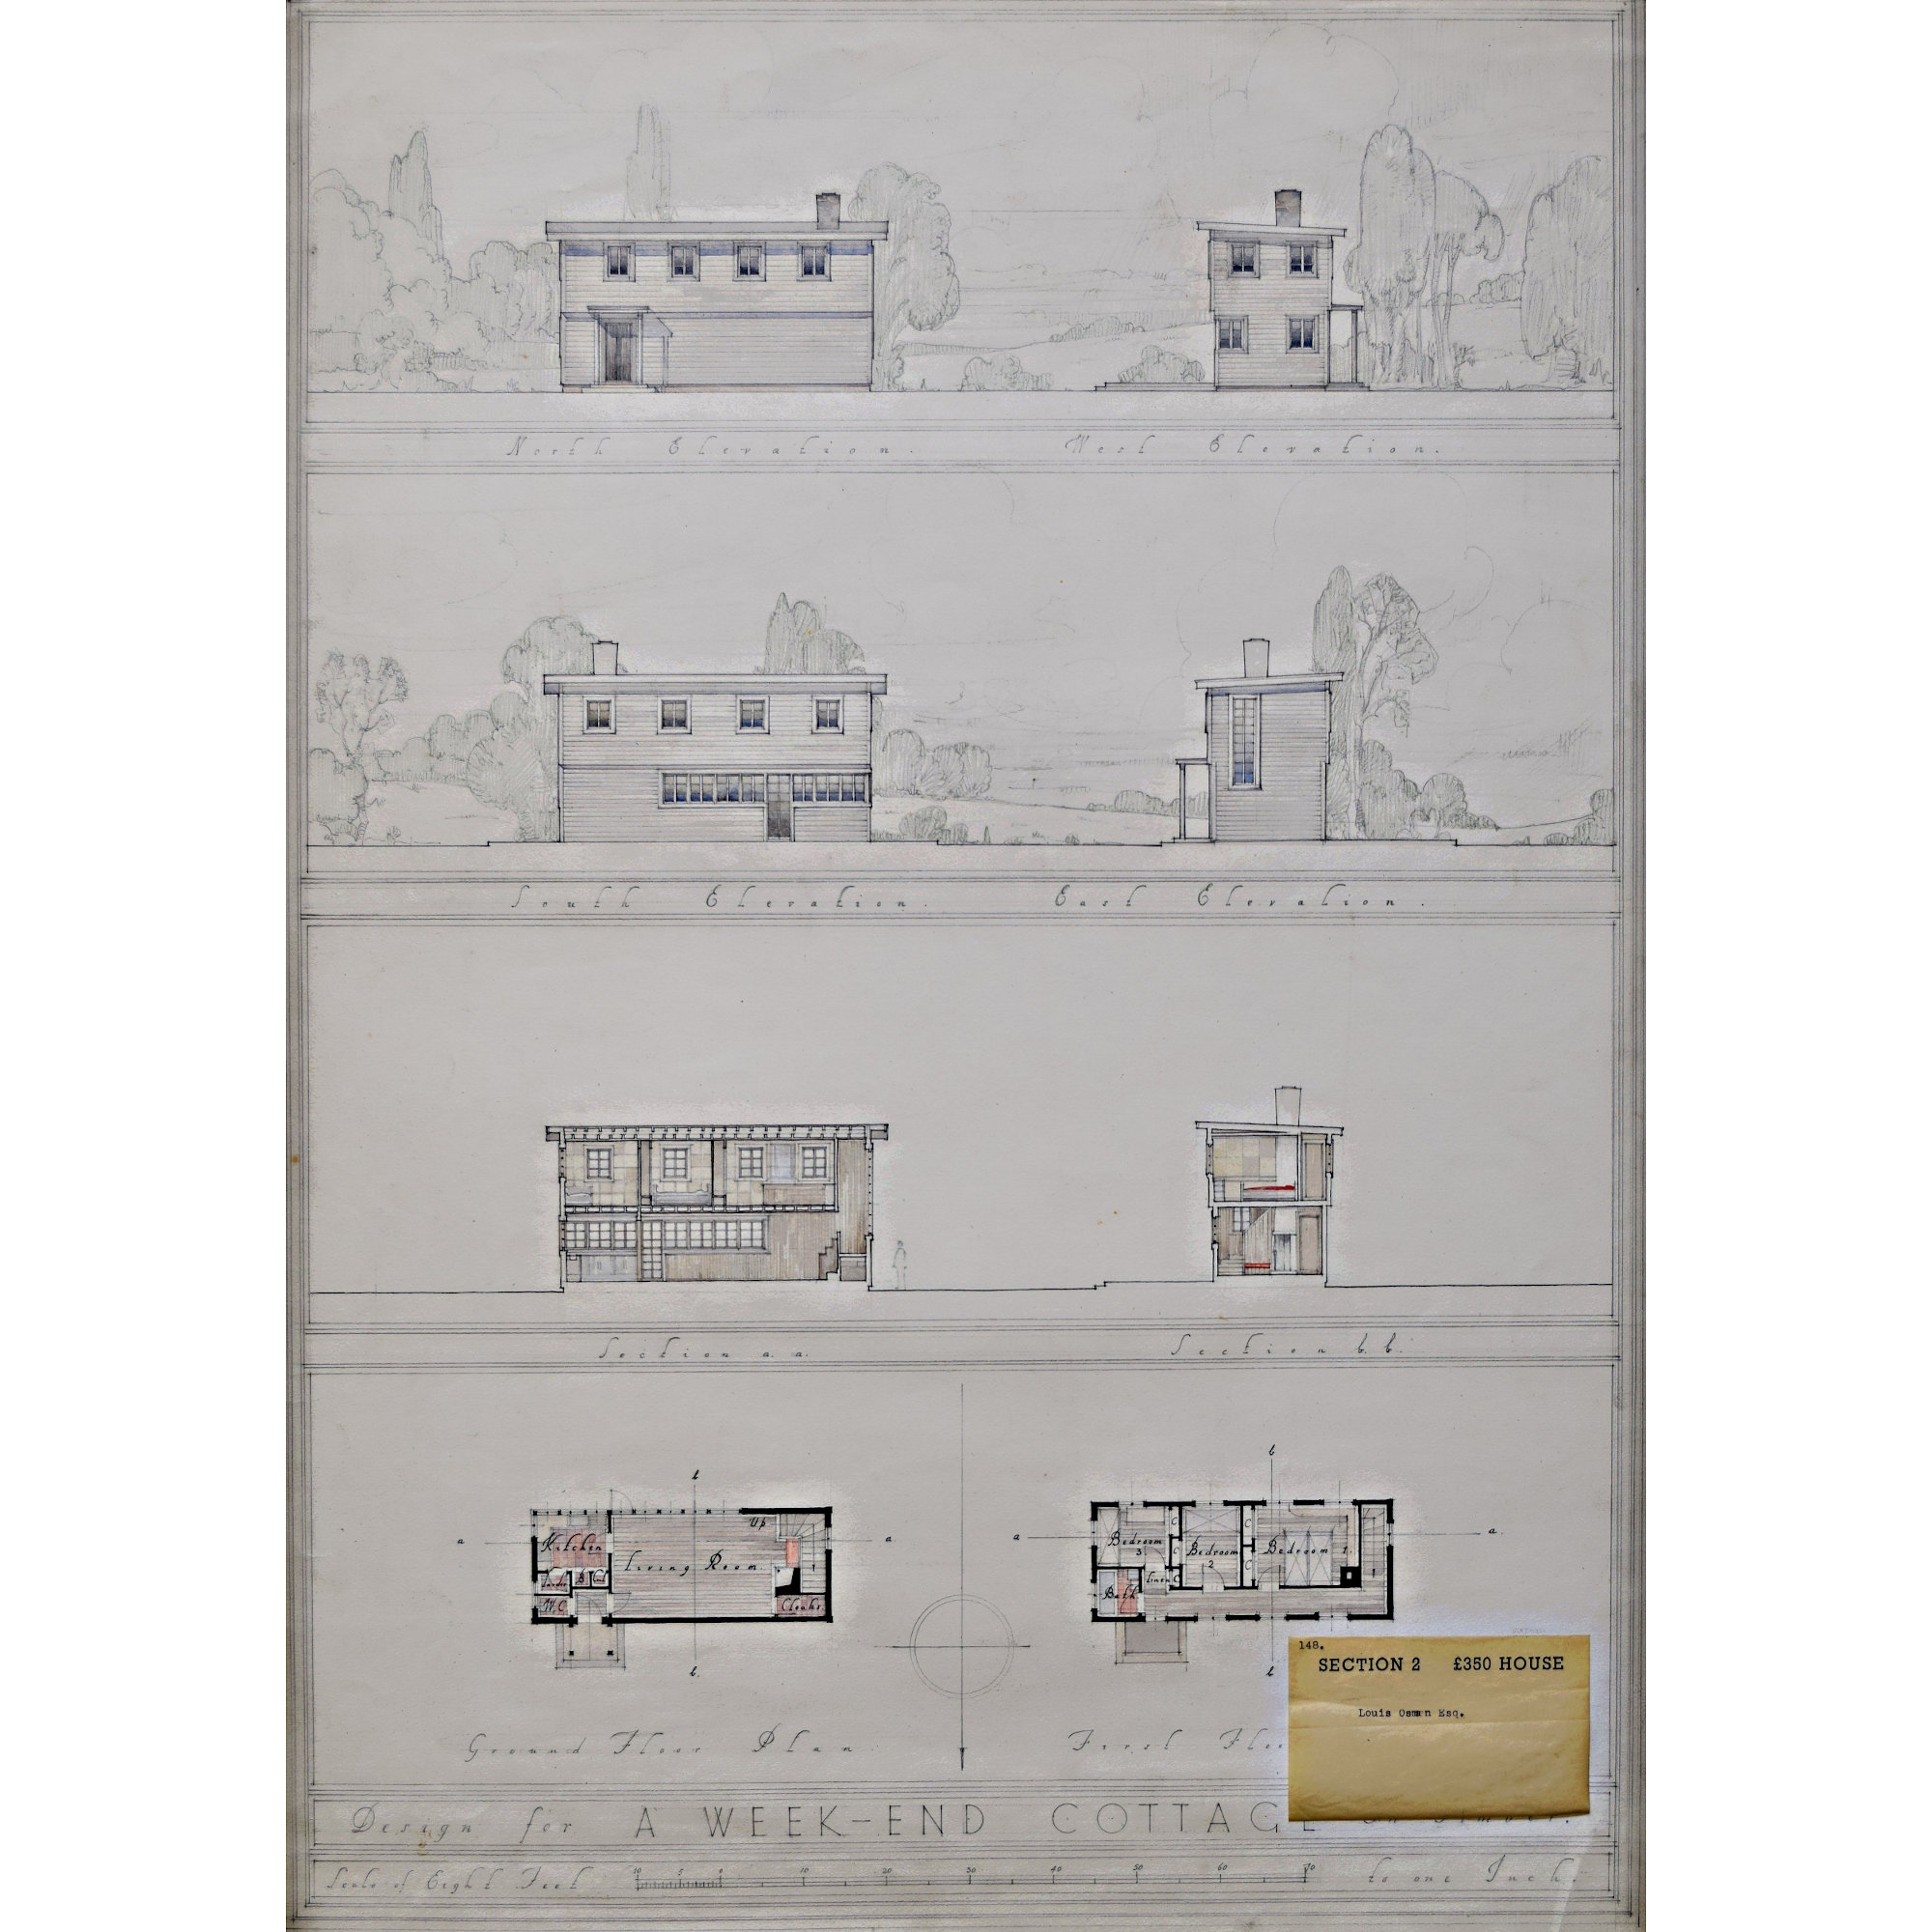 Louis Osman design for 350 pound modernist house